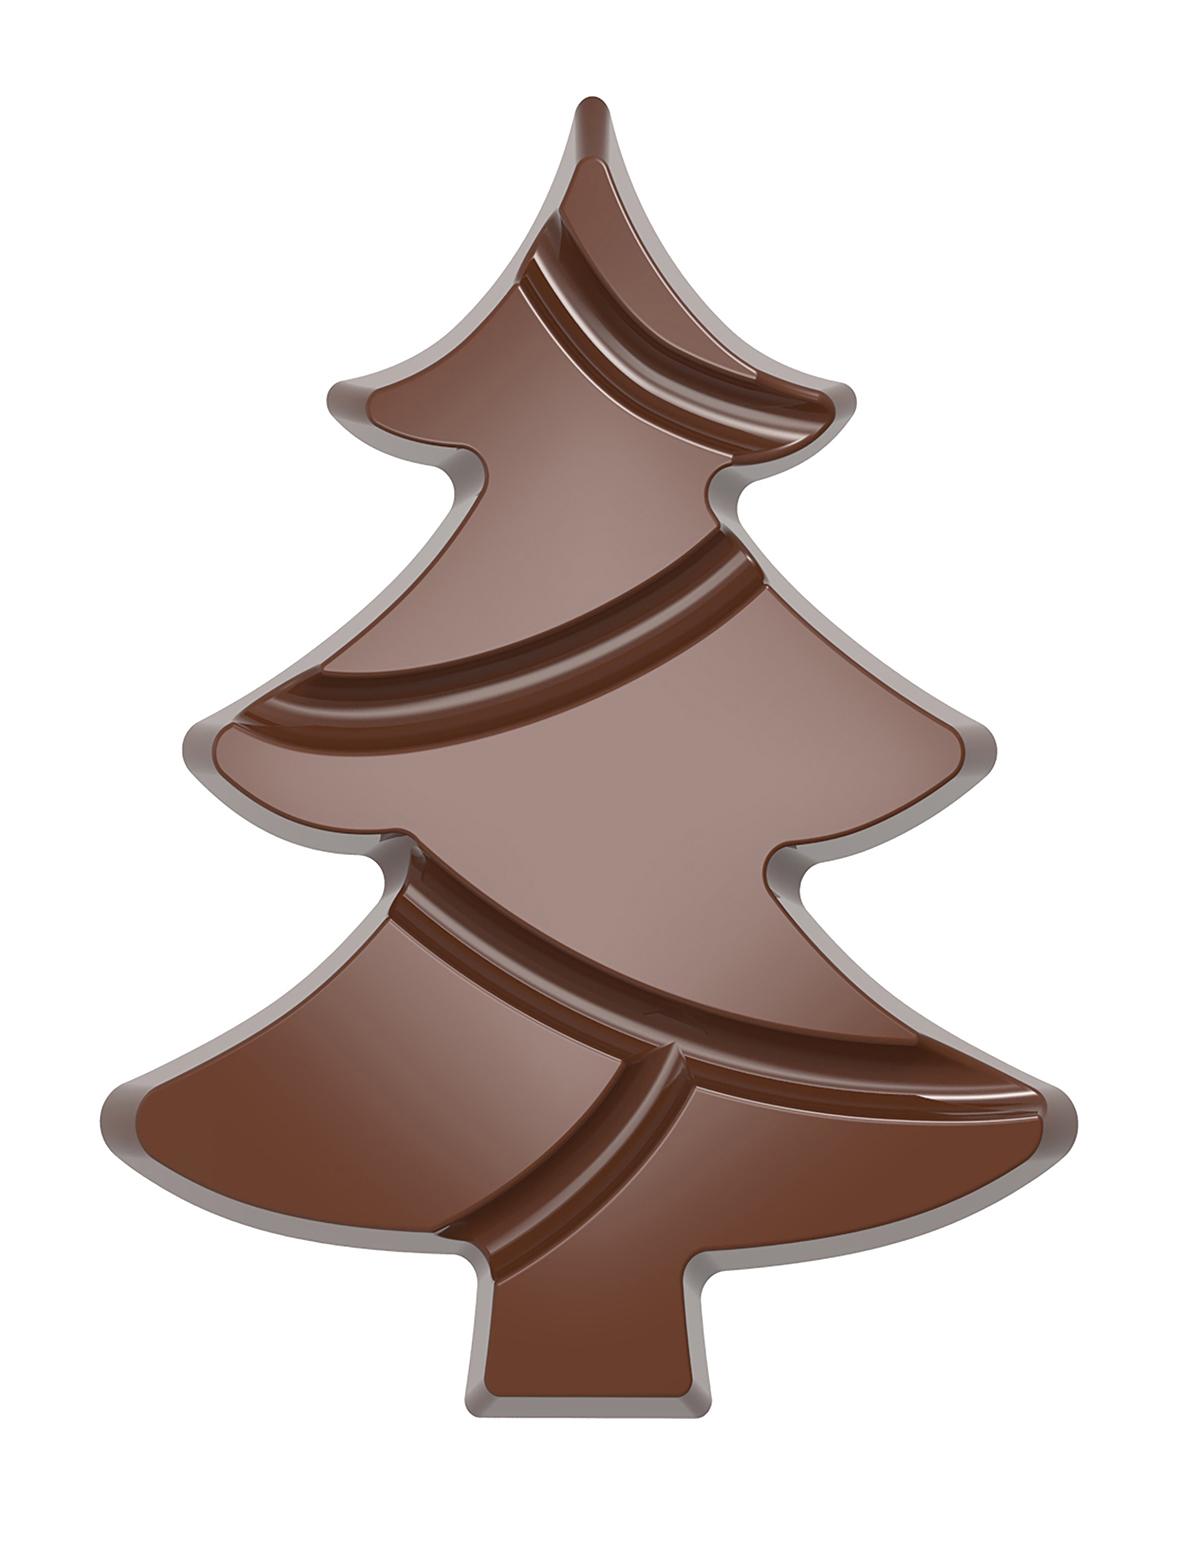 Billede af Chocolate World chokoladeform CW12008 Christmas tree / Juletræ